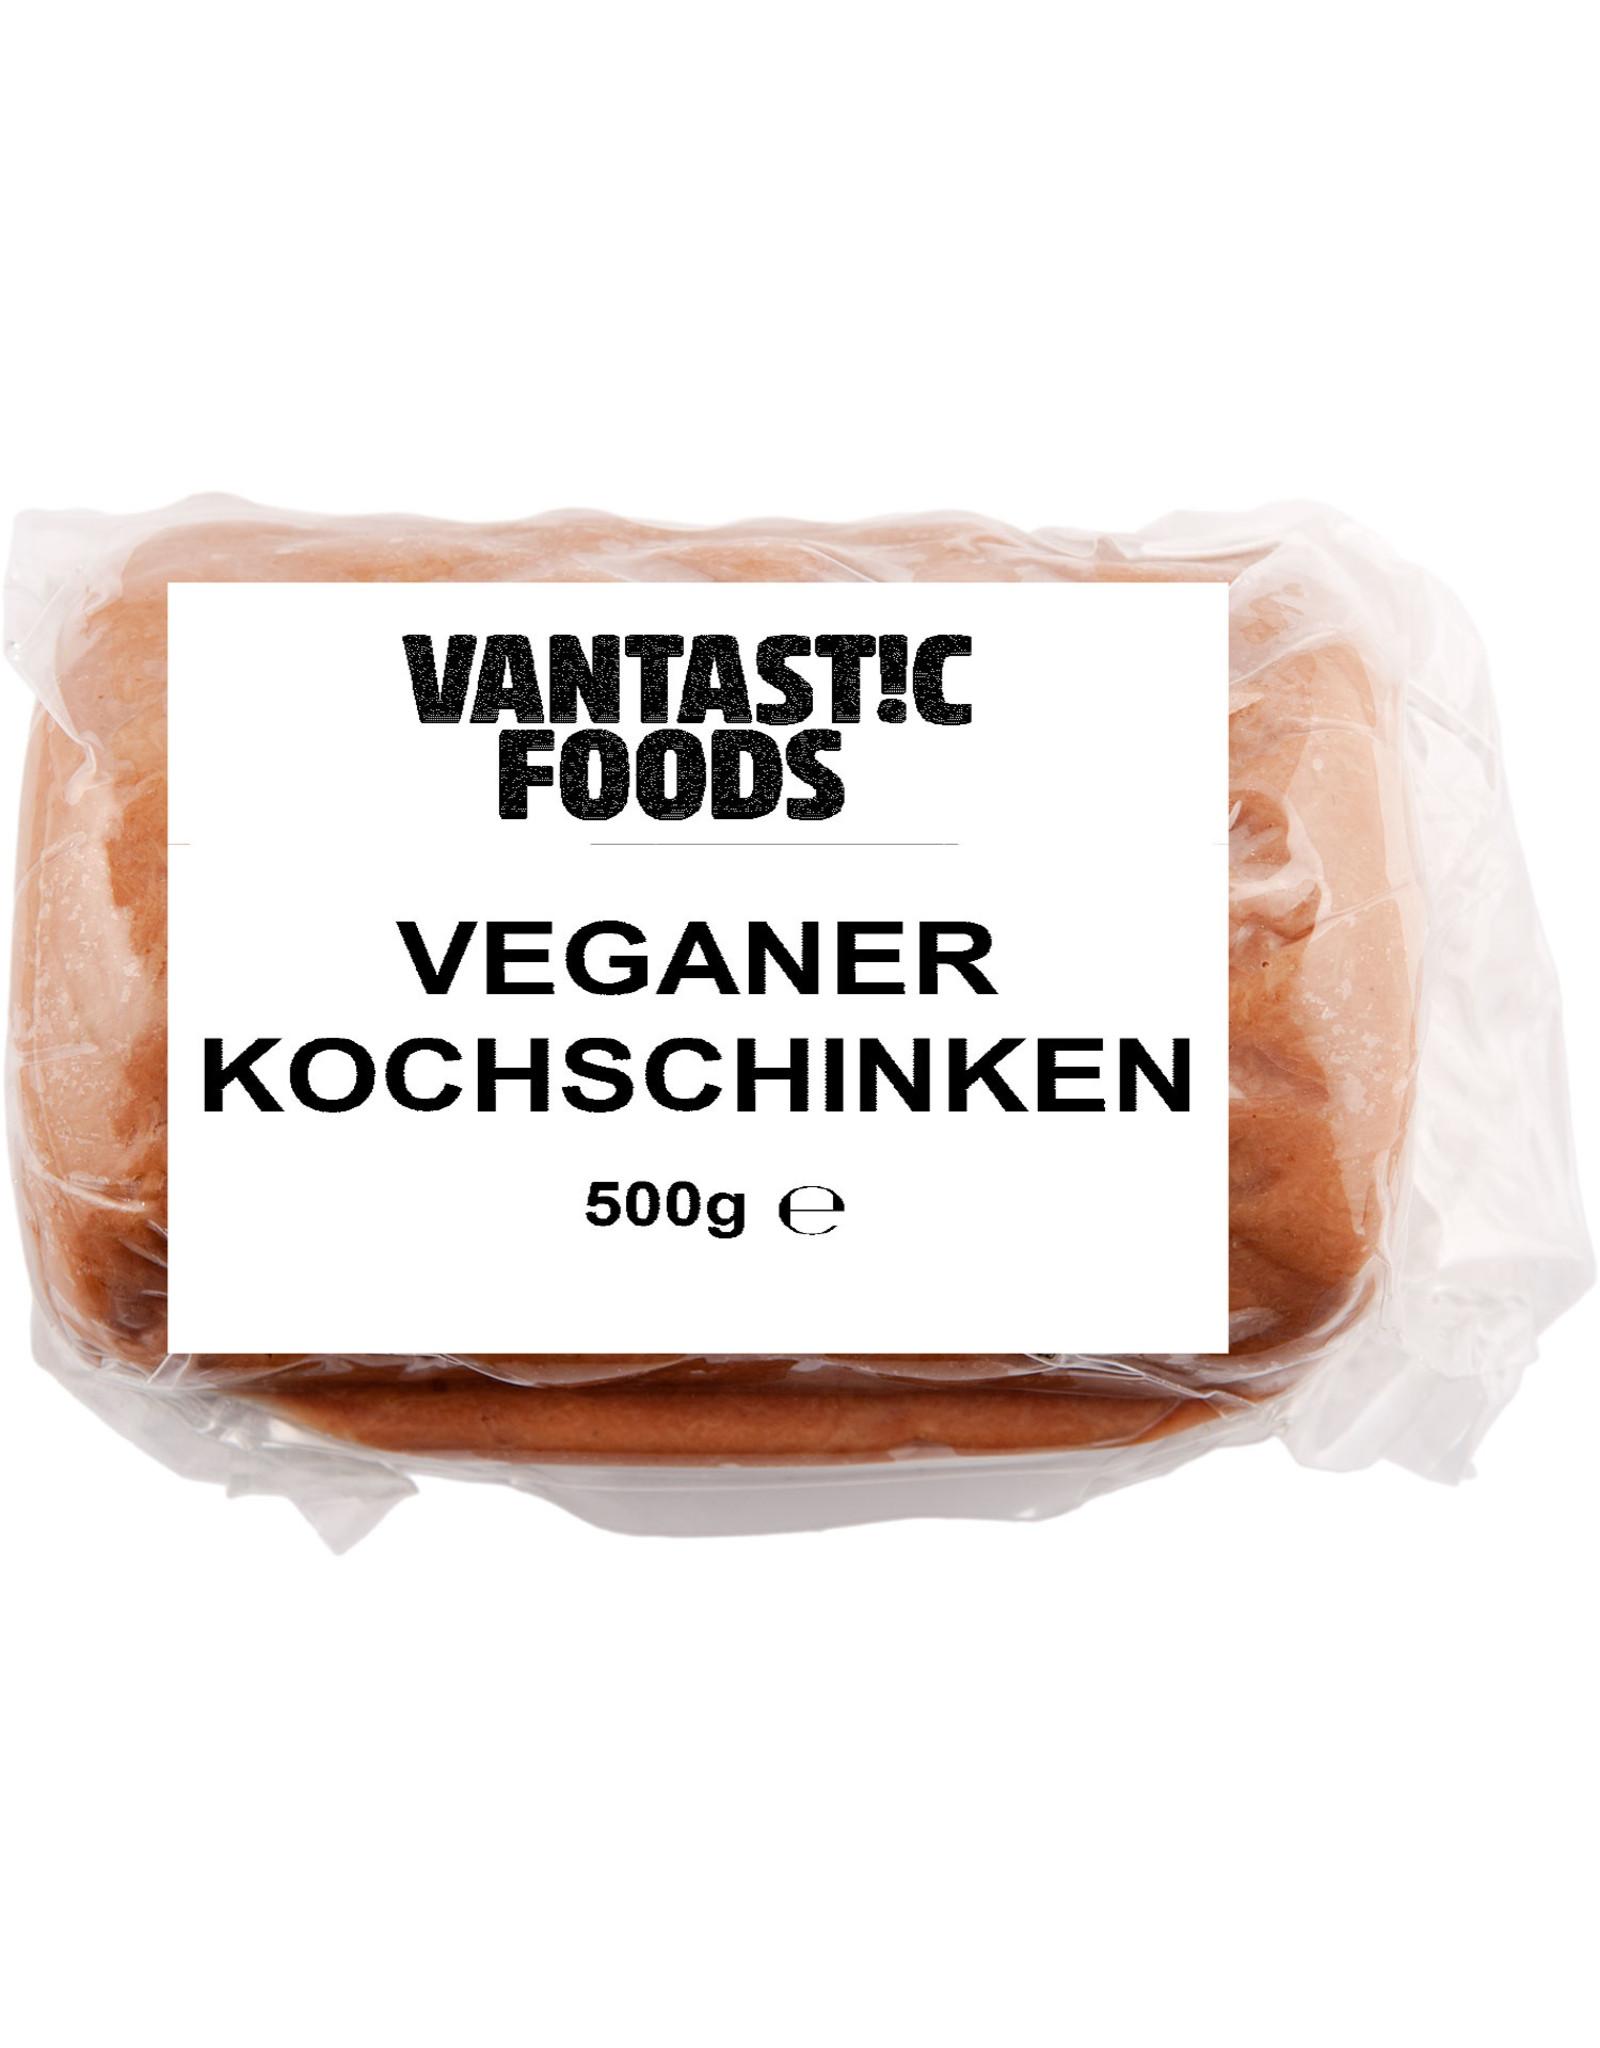 VANTASTIC FOODS JAMÓN COCIDO VEGANO, 500G